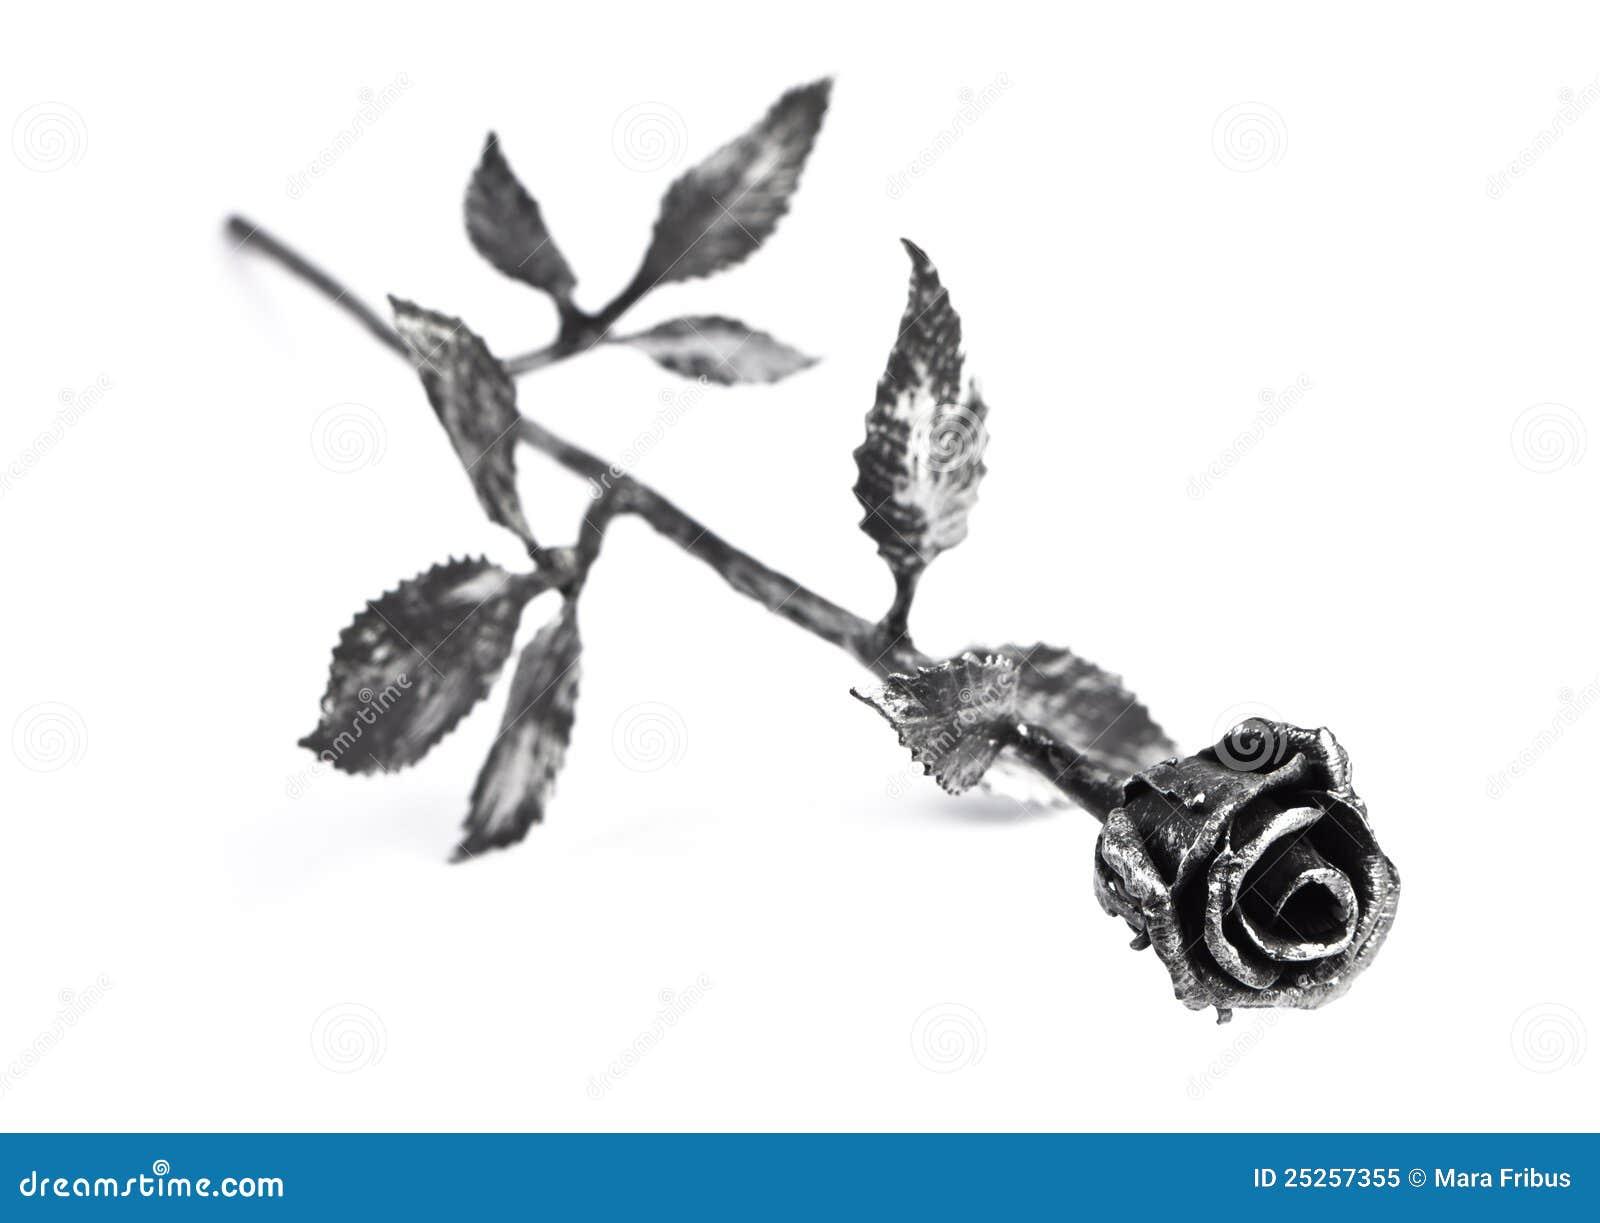 metal rose stock image  image of flower  despair  romantic